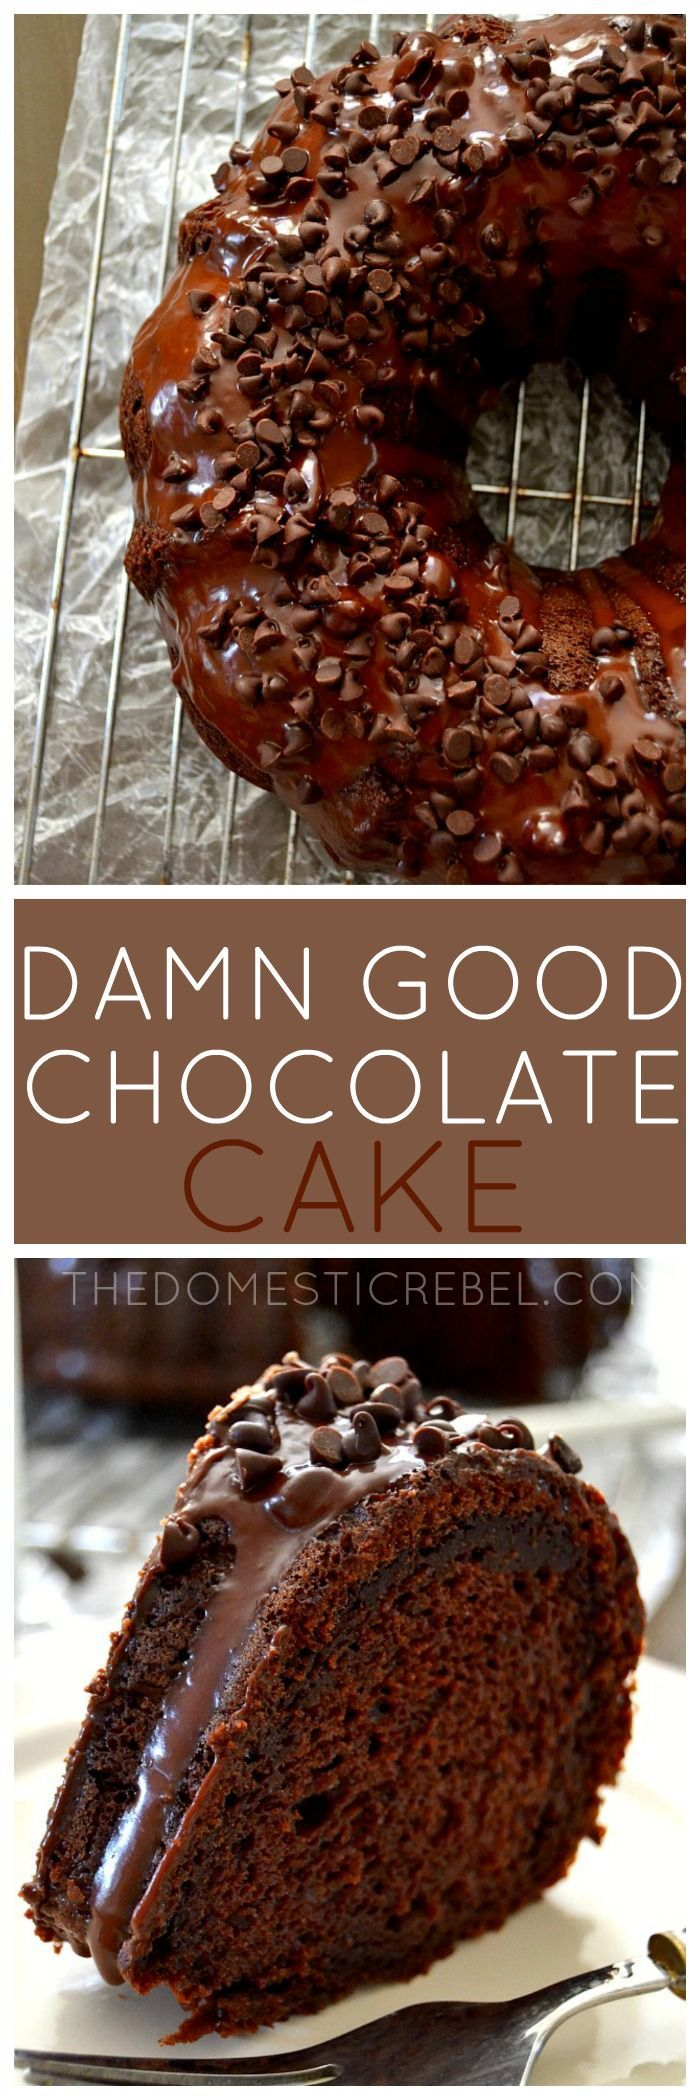 Best 25+ Chocolate cakes ideas on Pinterest   Chocolate cake, Cake recipes and Best cake recipes